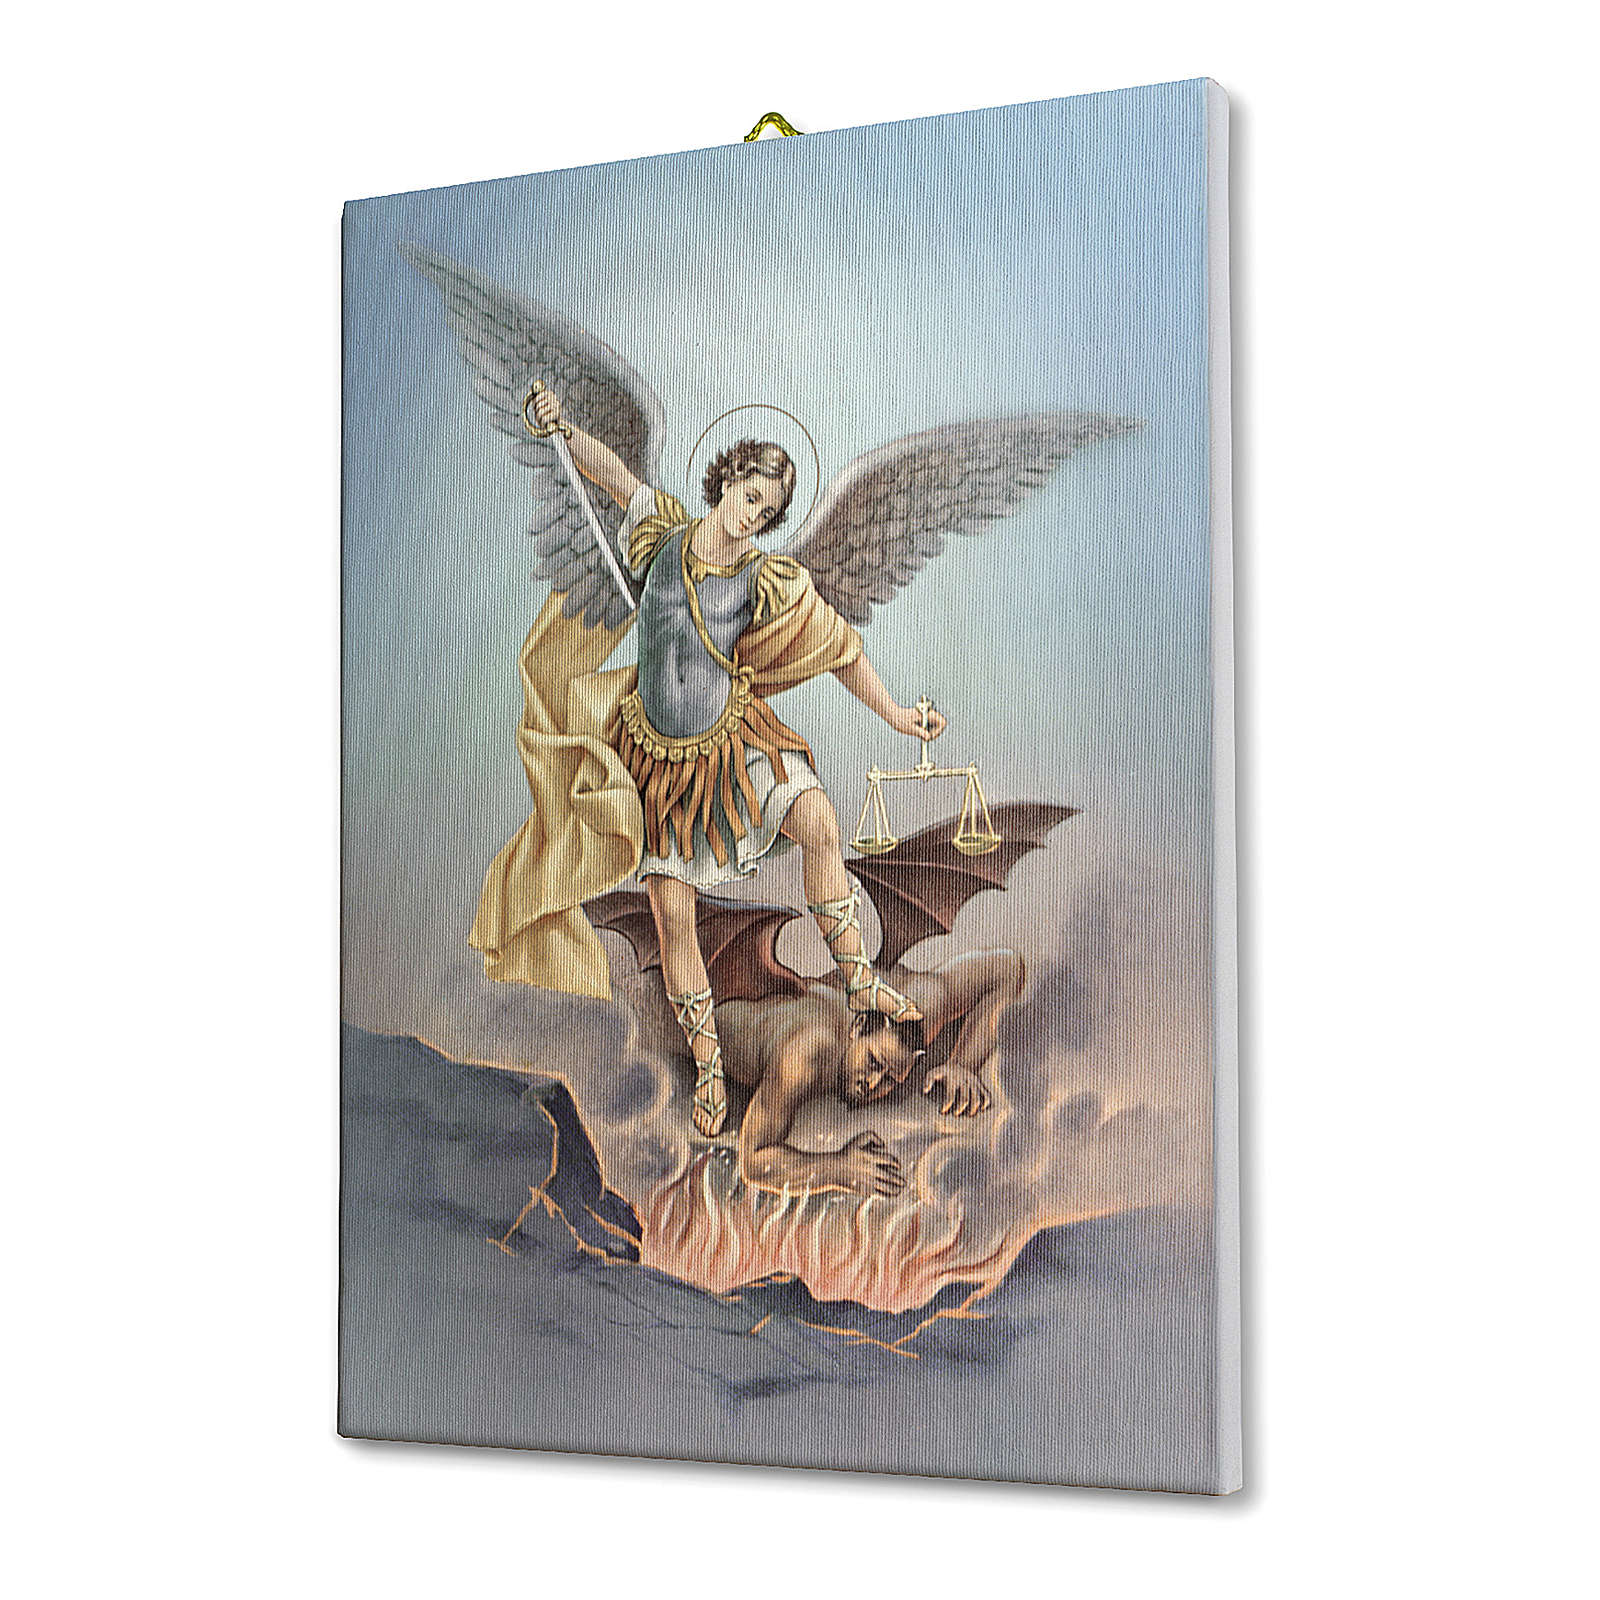 Quadro su tela pittorica San Michele Arcangelo 70x50 cm 3